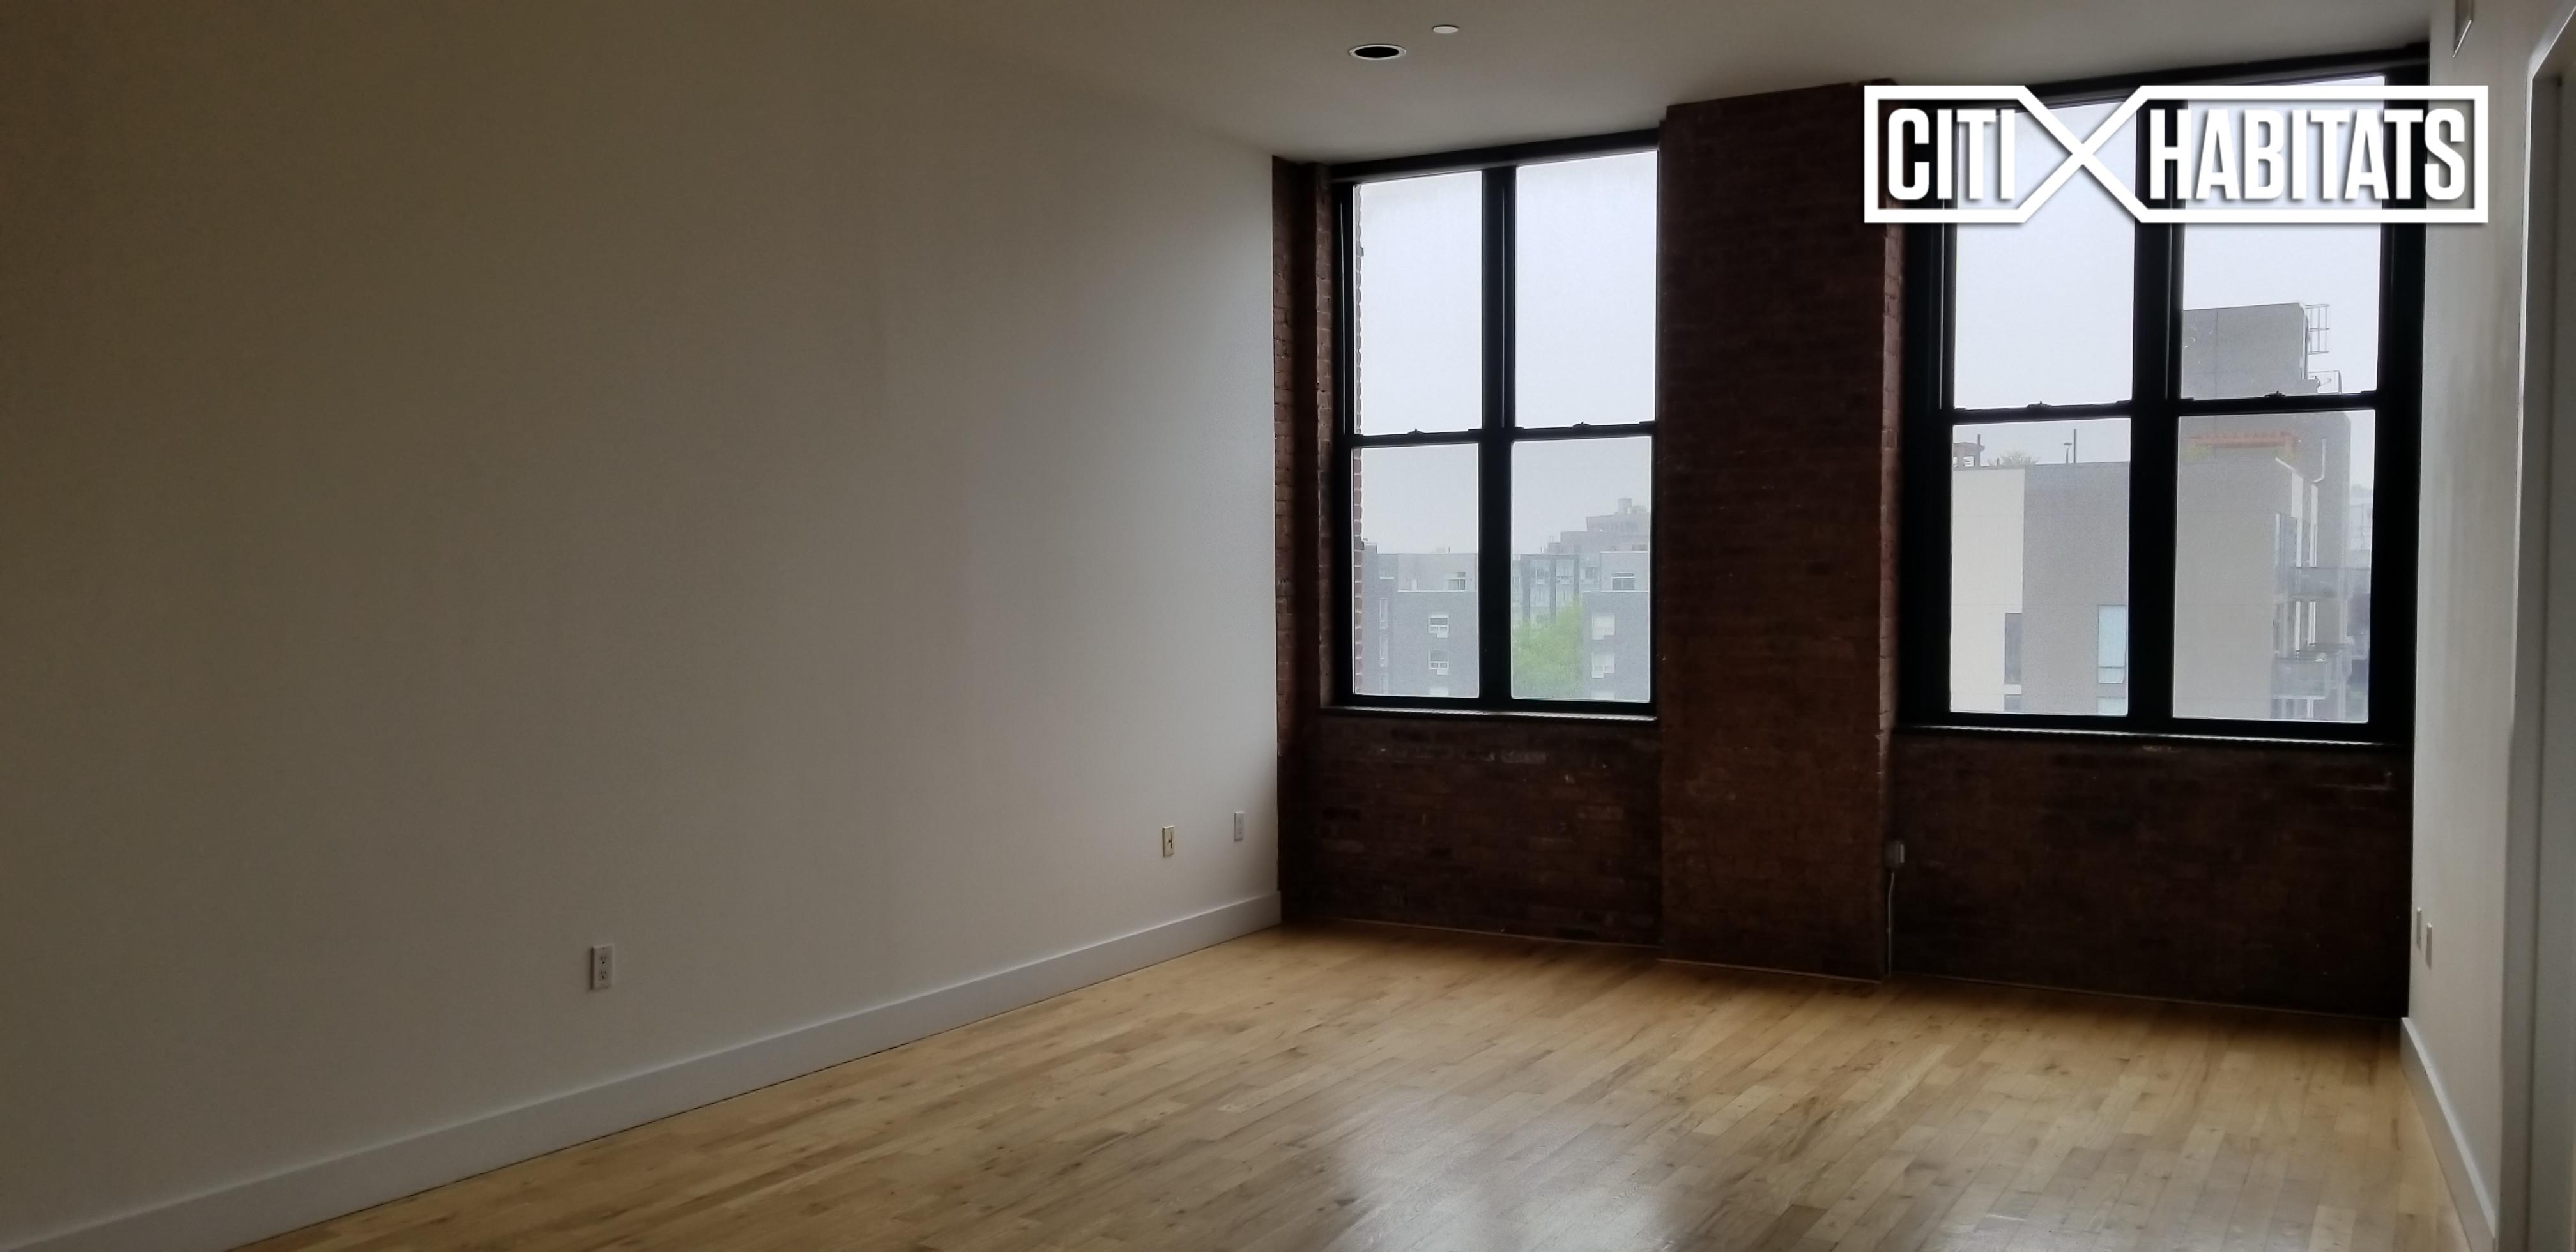 michigan hardwood floors services llc of william gonzalez citihabitats com within 95154137